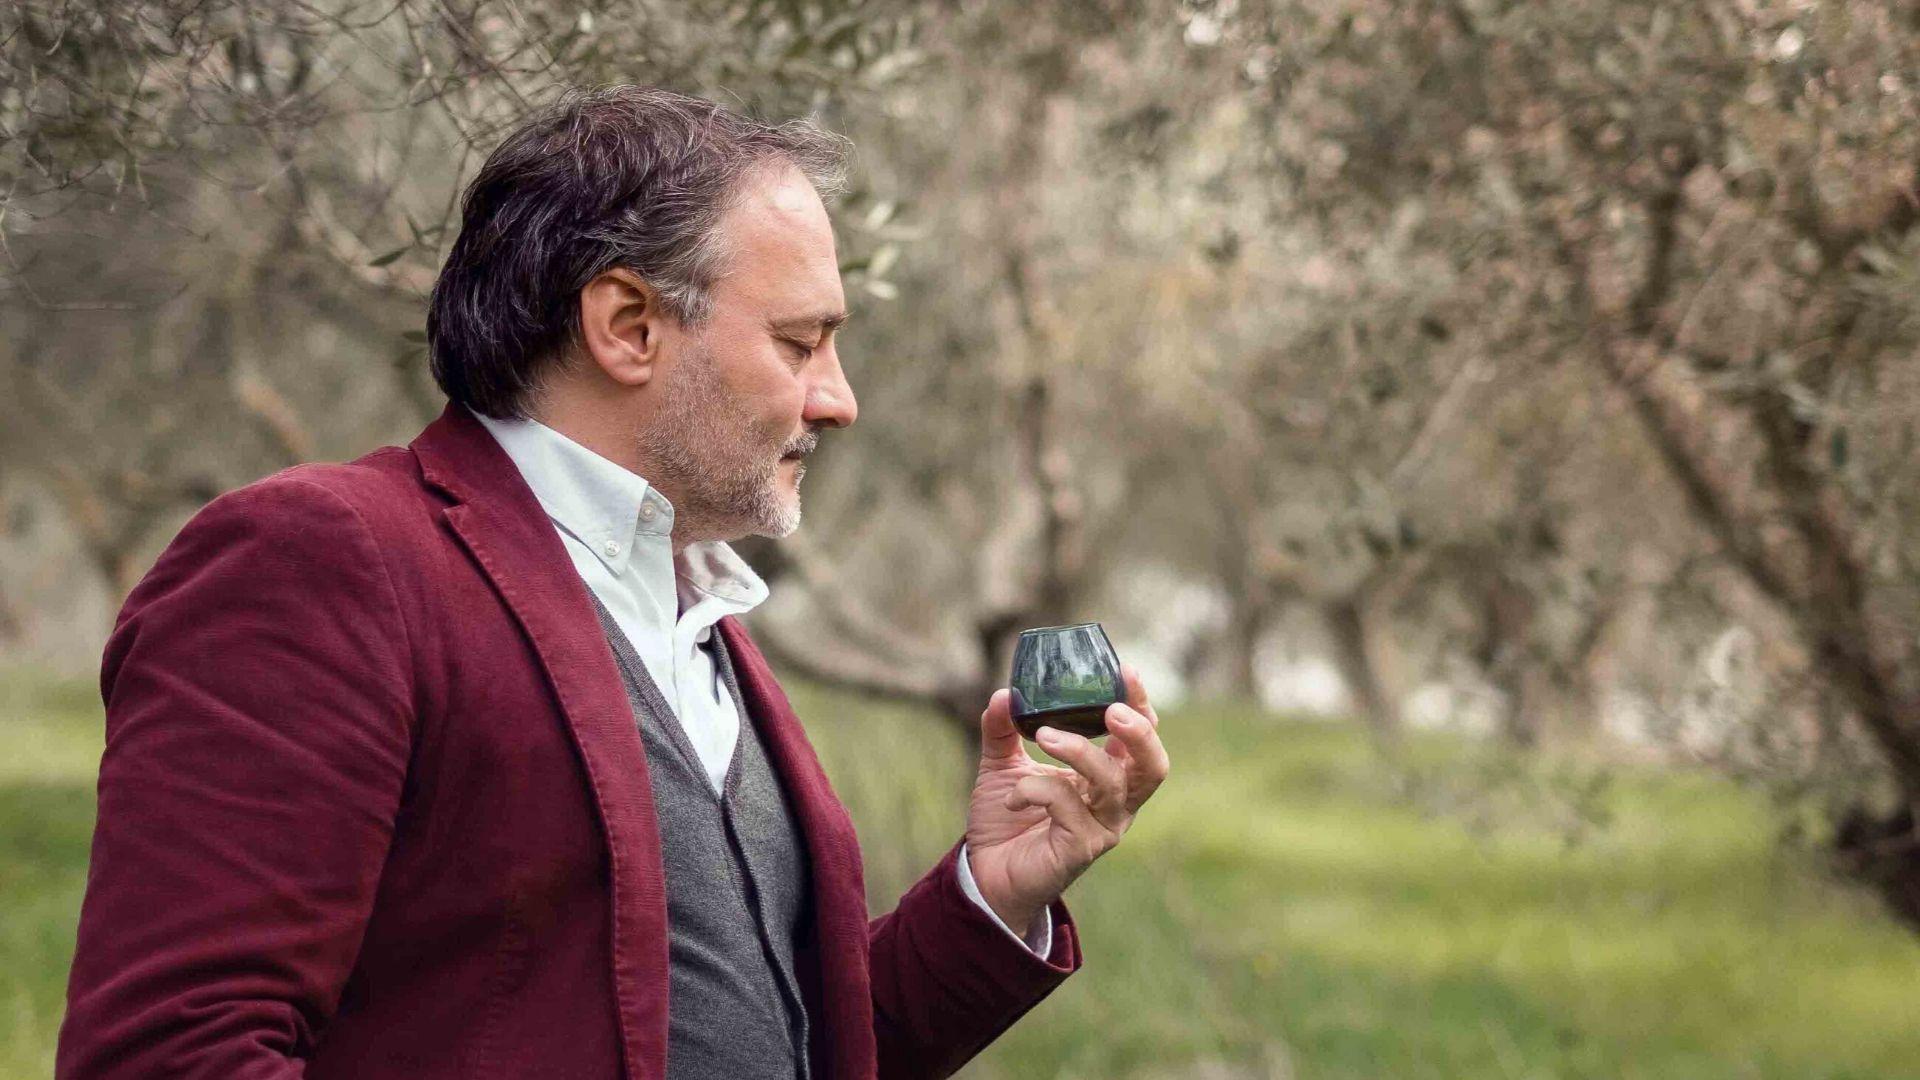 Gutes Öl, schlechtes Öl: Marco Oreggias Rat